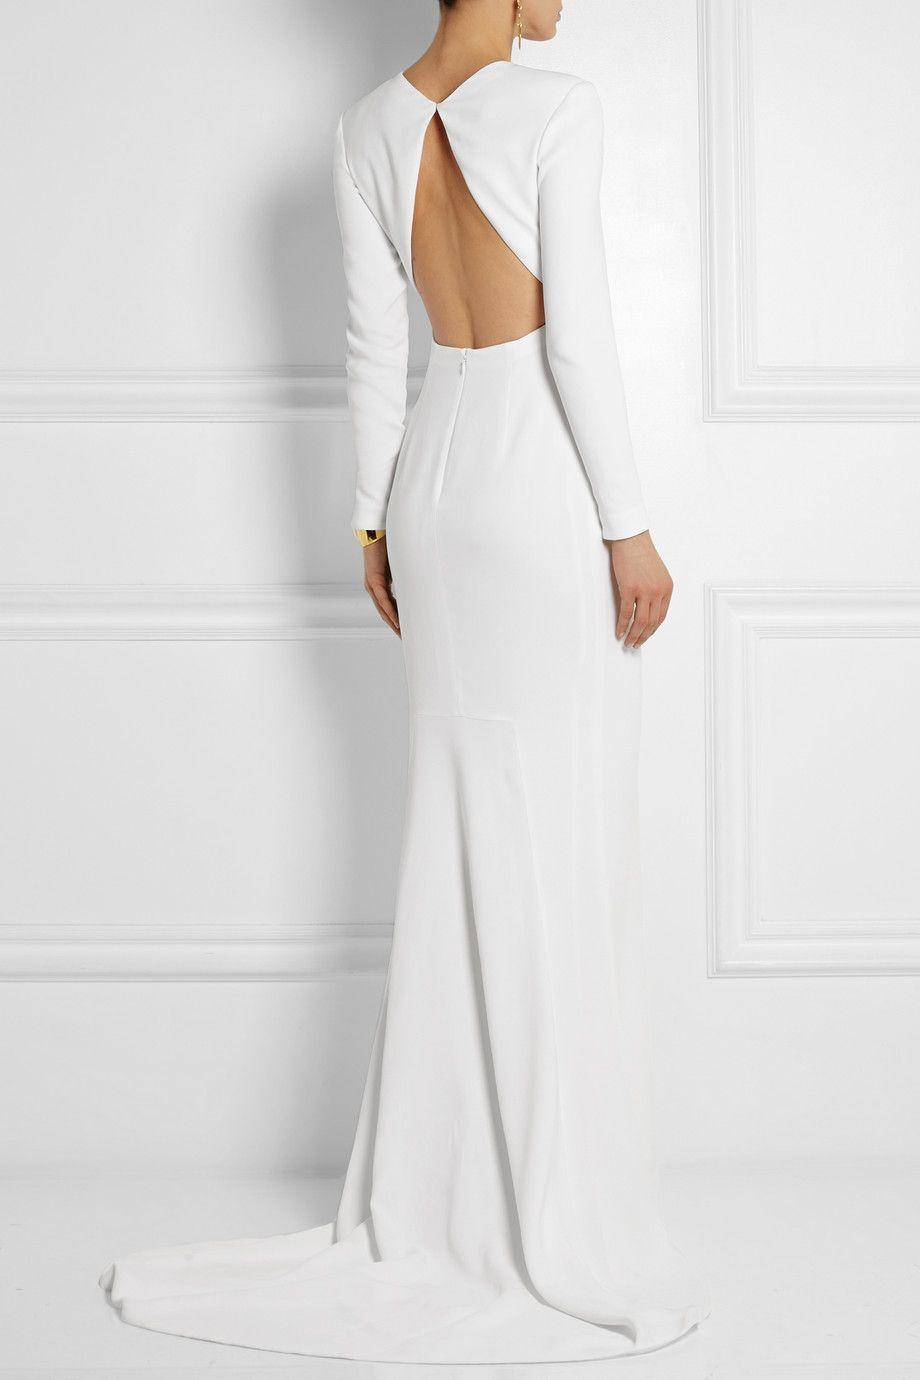 Pin On Elegant Gowns [ 1380 x 920 Pixel ]